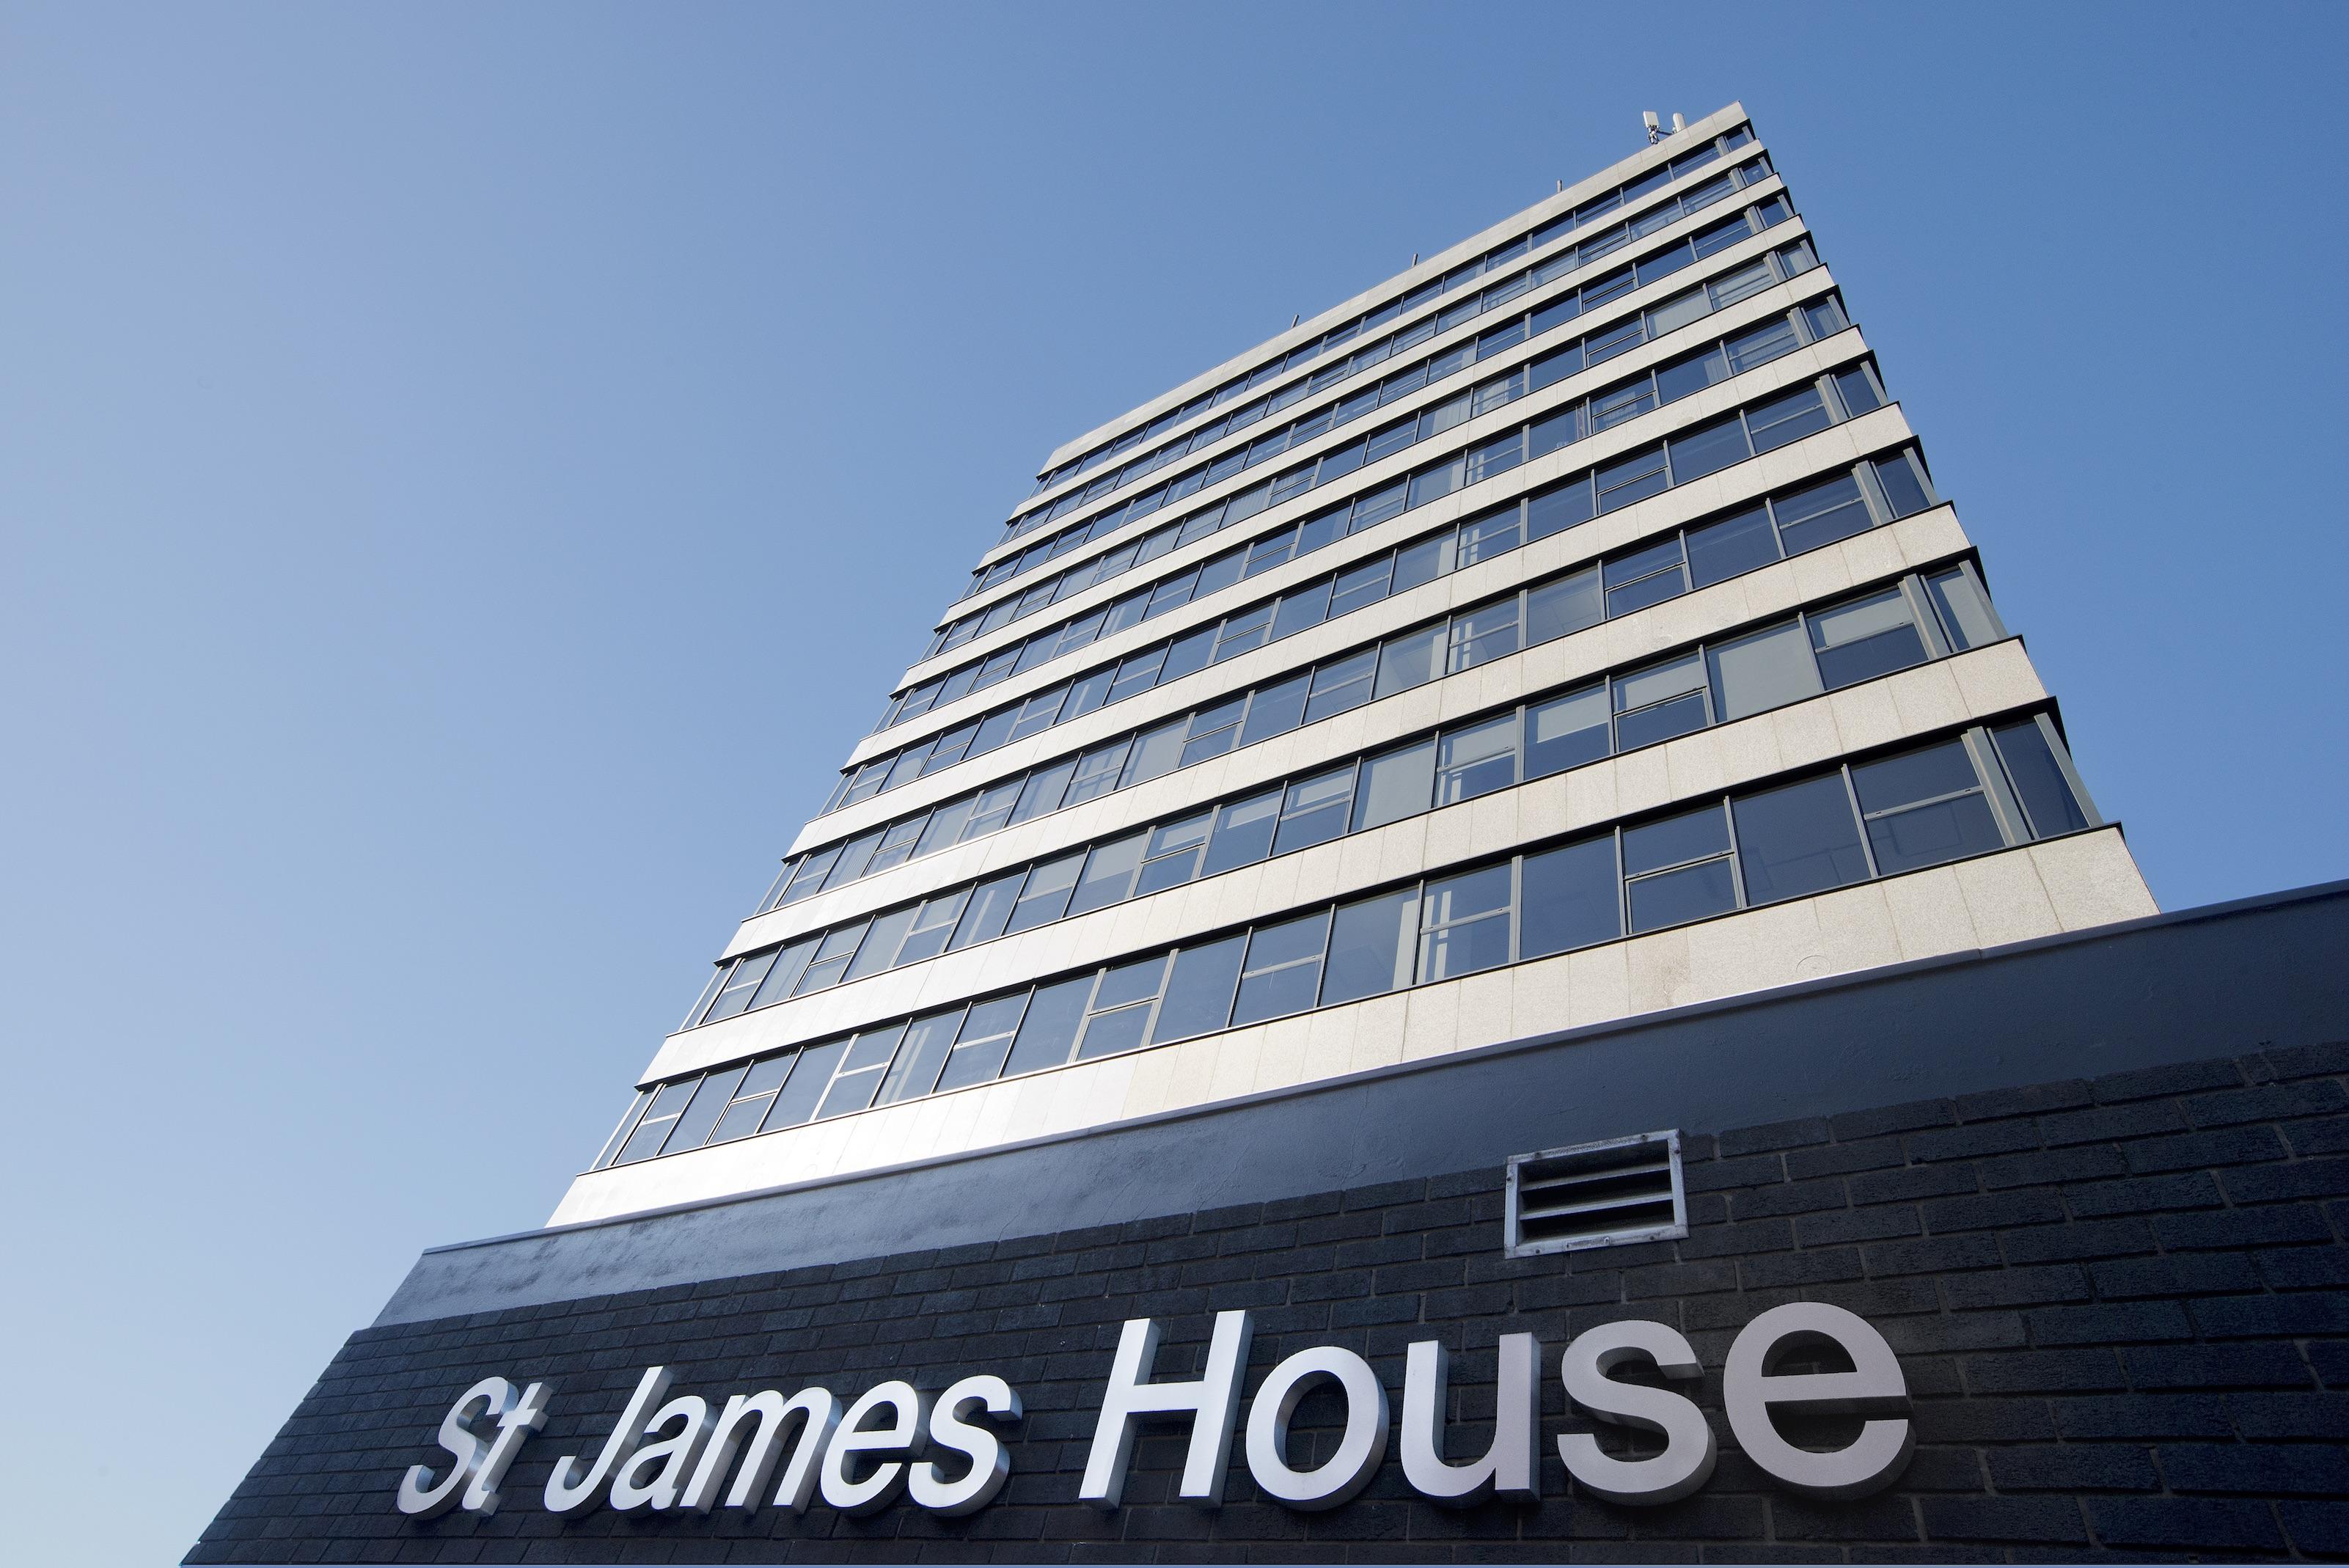 St James House